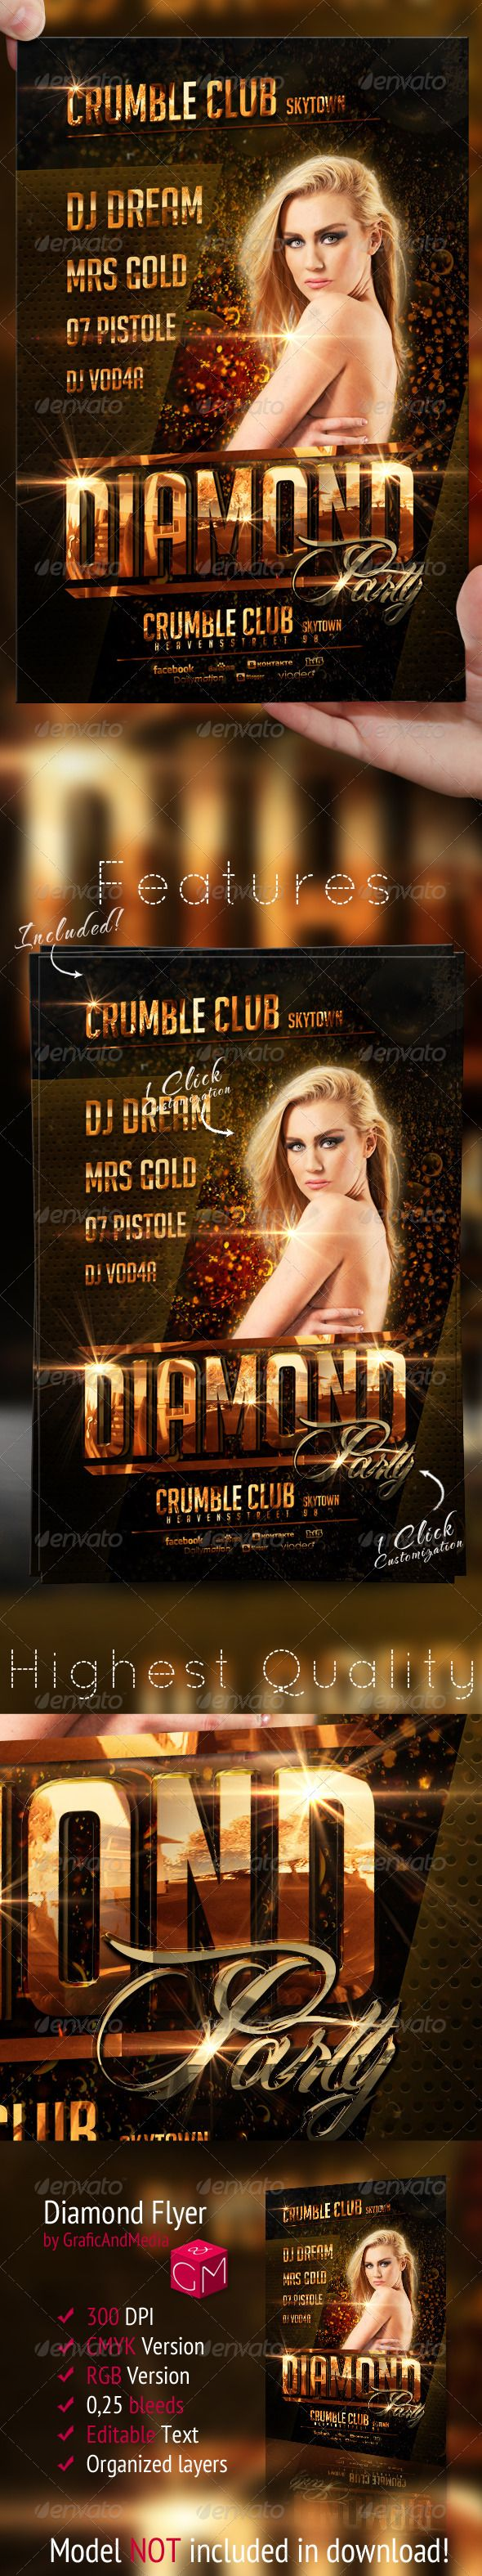 Diamond Nightclub Flyer Template  #GraphicRiver        Diamond Party Flyer Templ…